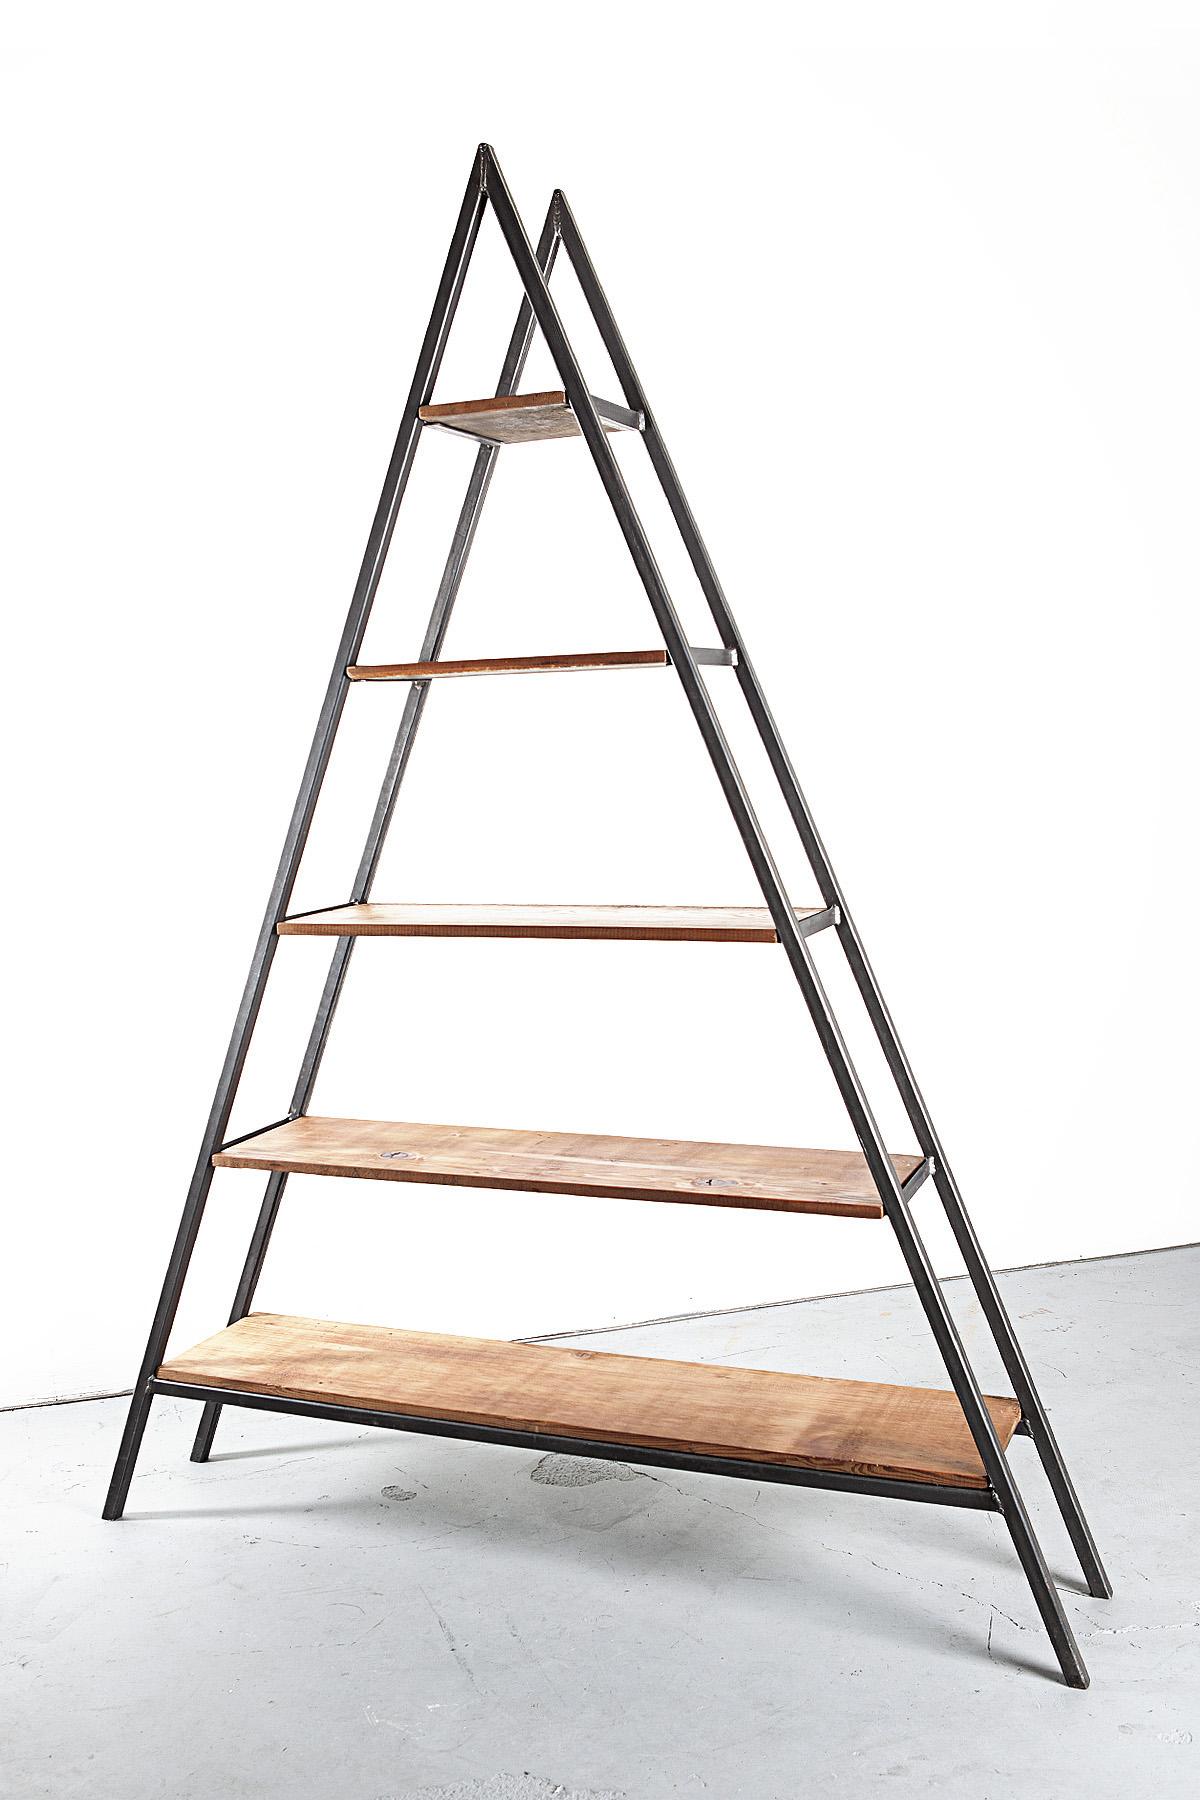 Custom Reclaimed Wood Triangle Shelf